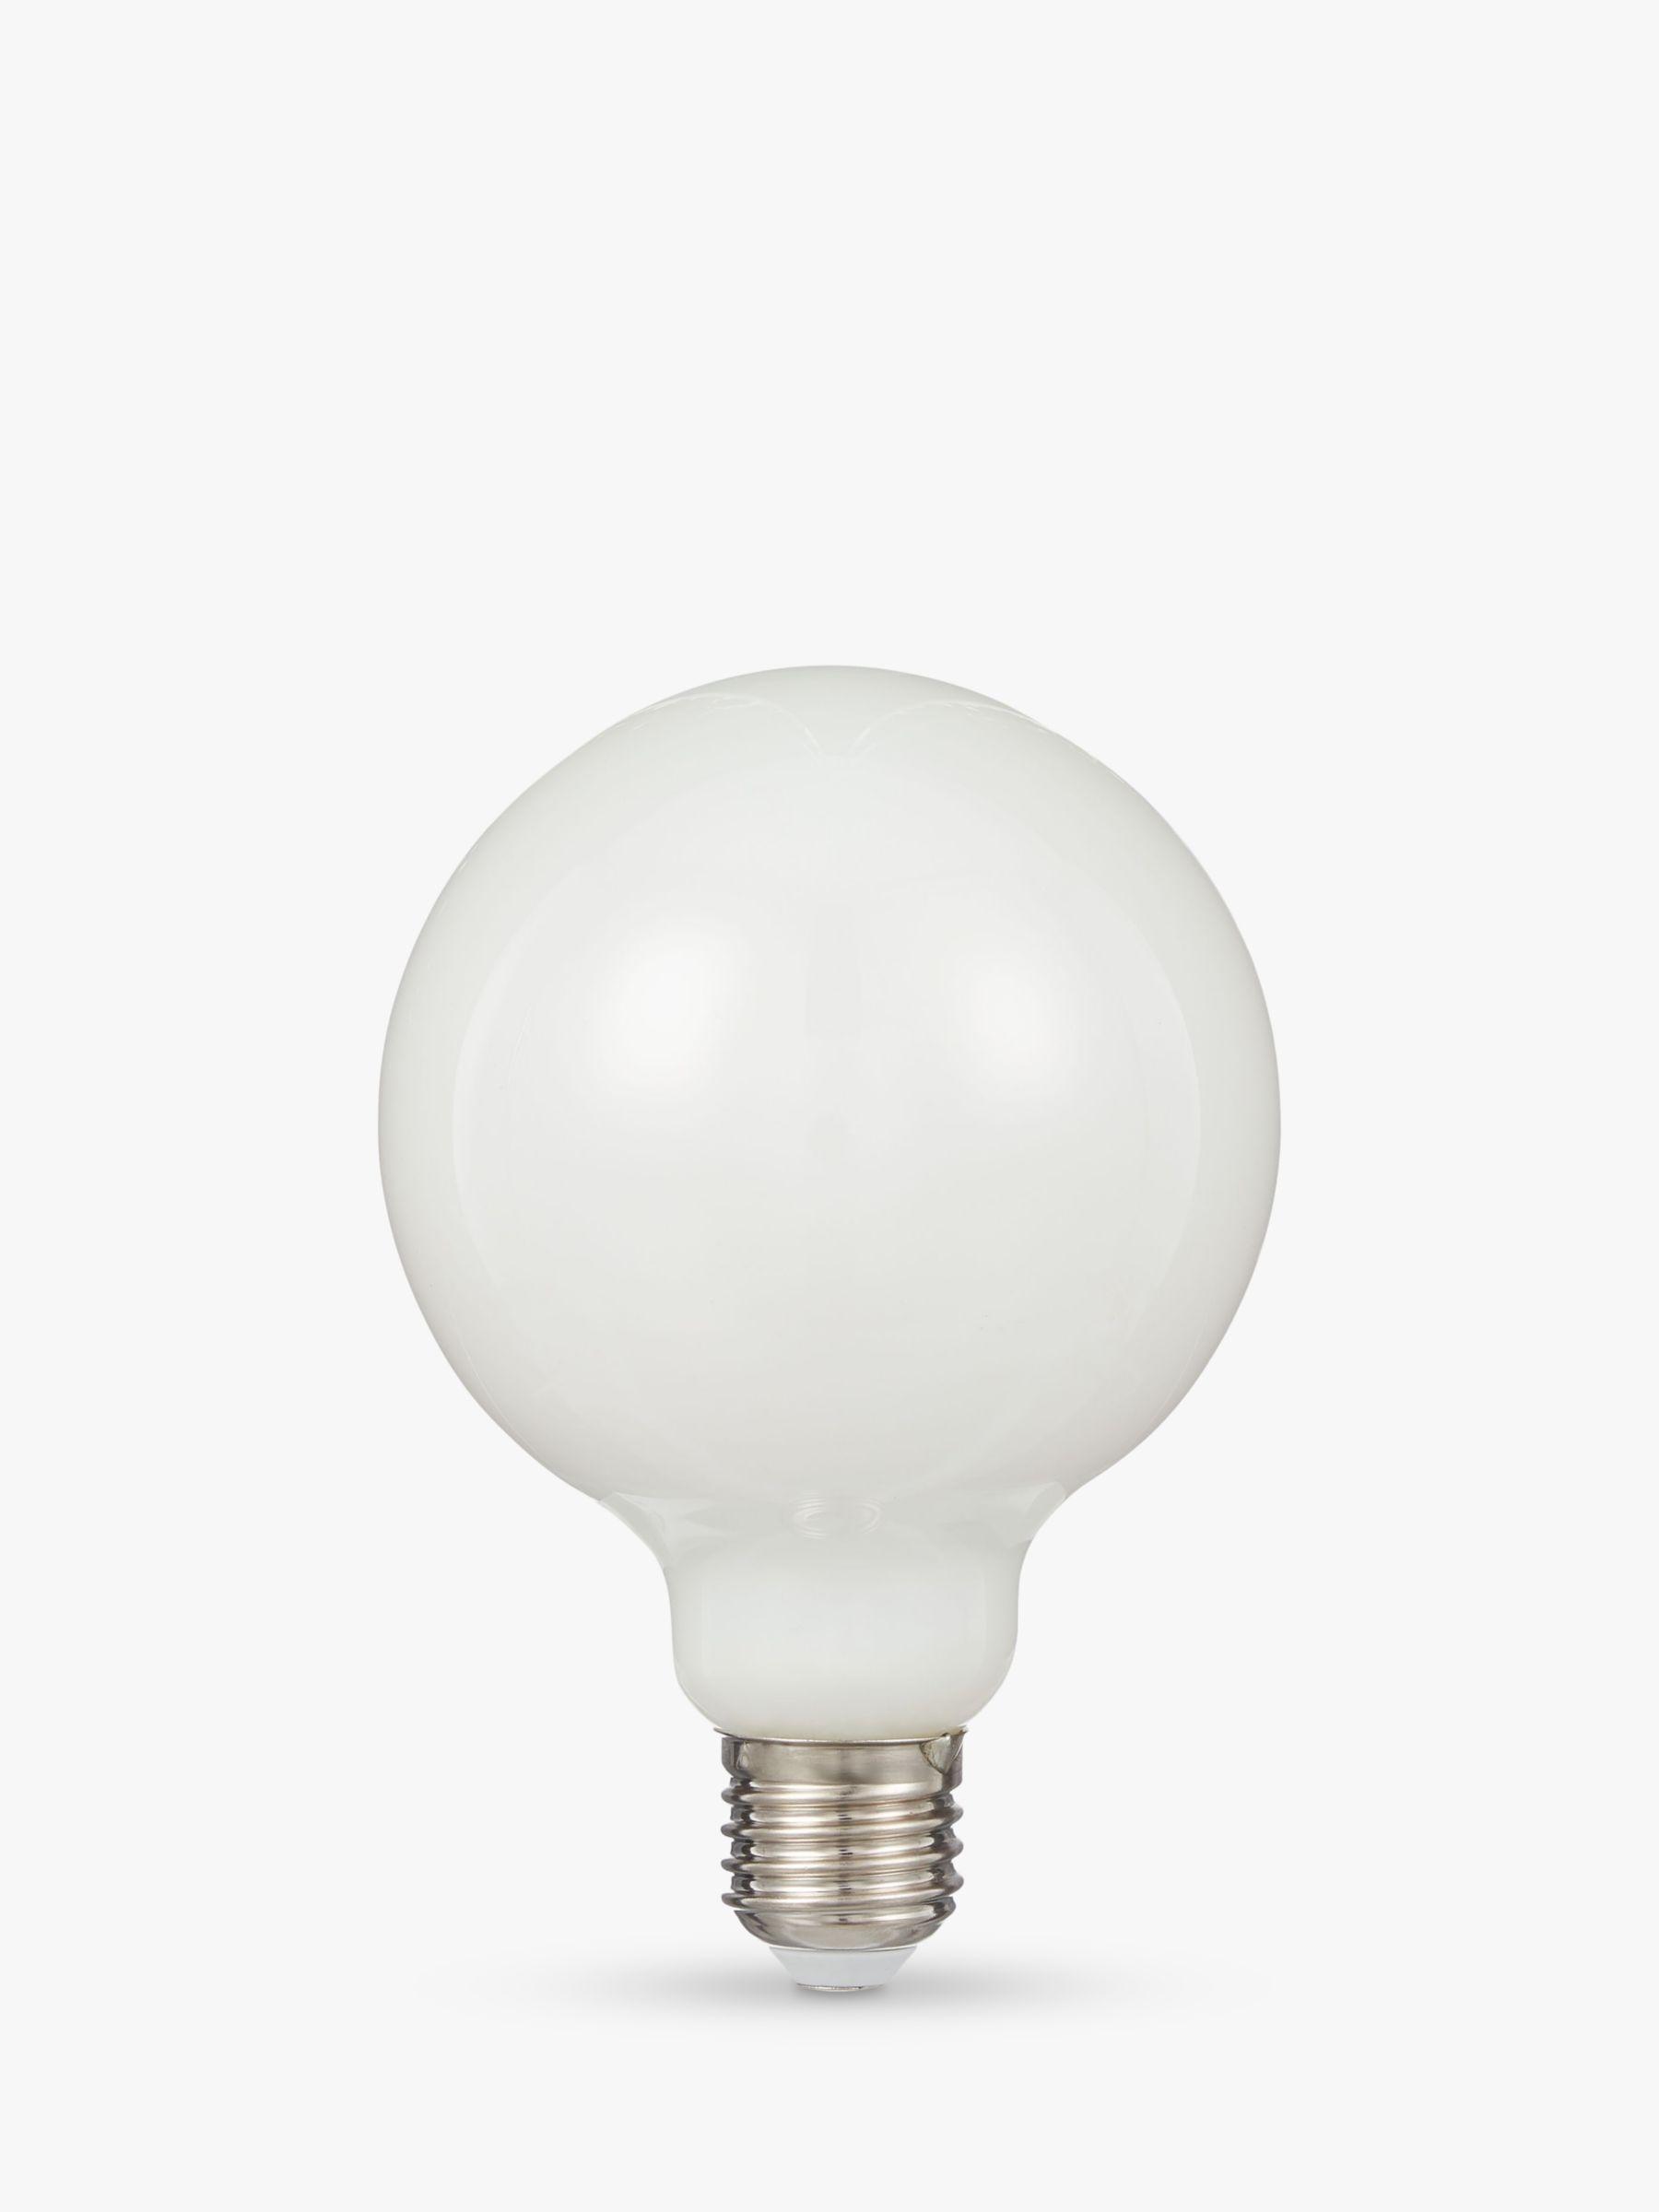 Calex Calex 8W ES LED Dimmable Globe Bulb, White